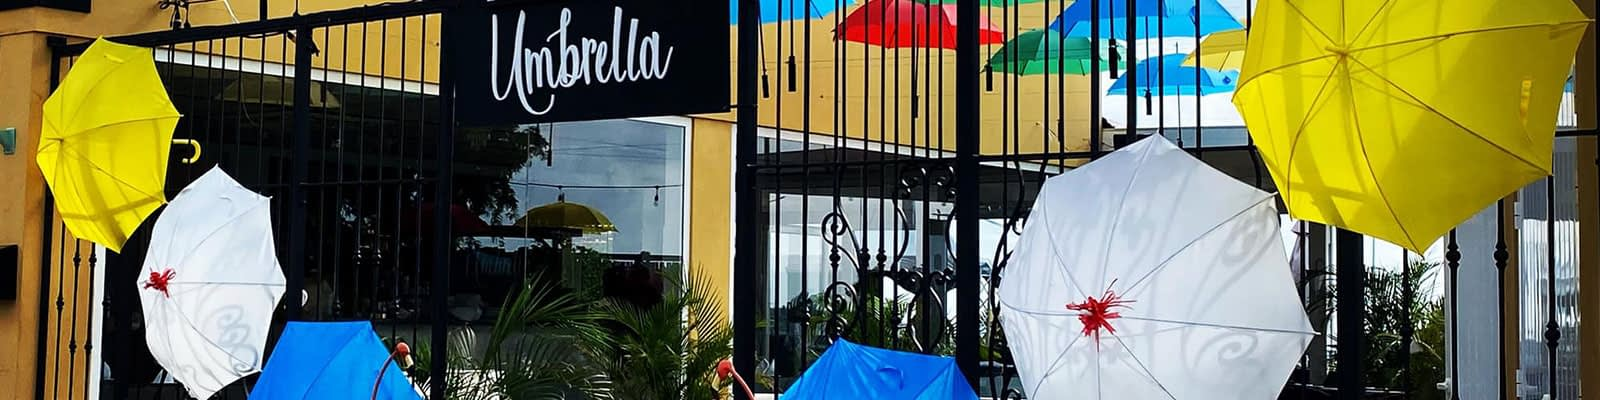 umbrella-restaurant-bonaire-slider-image-2